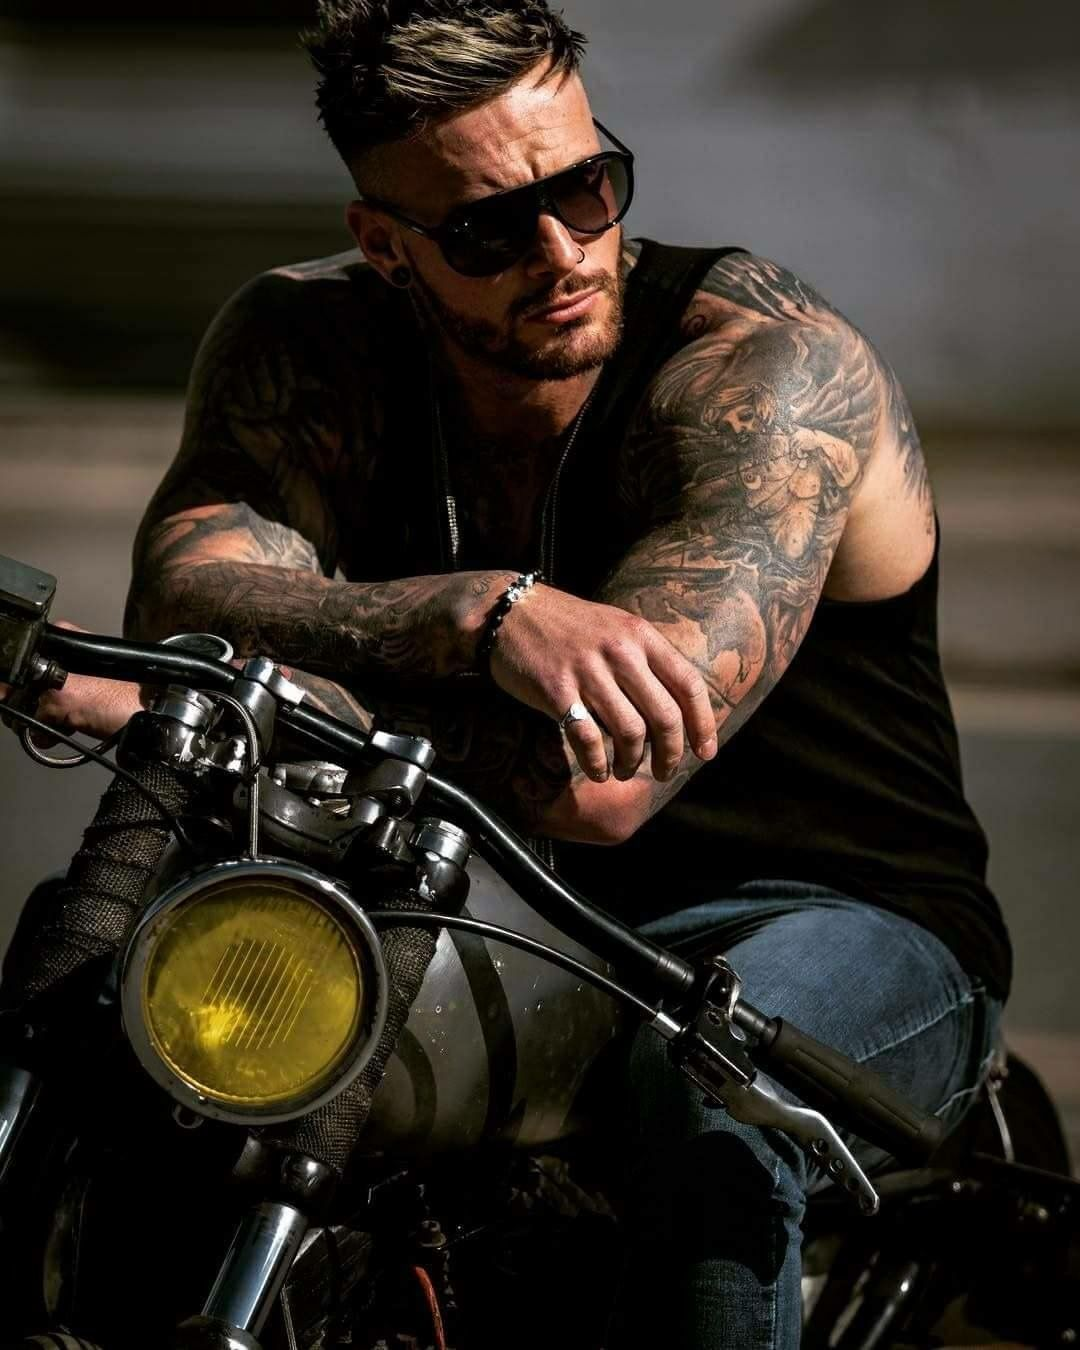 Mens Tattoos Beards and Motorcycles Biker Long sleeve T Shirt top